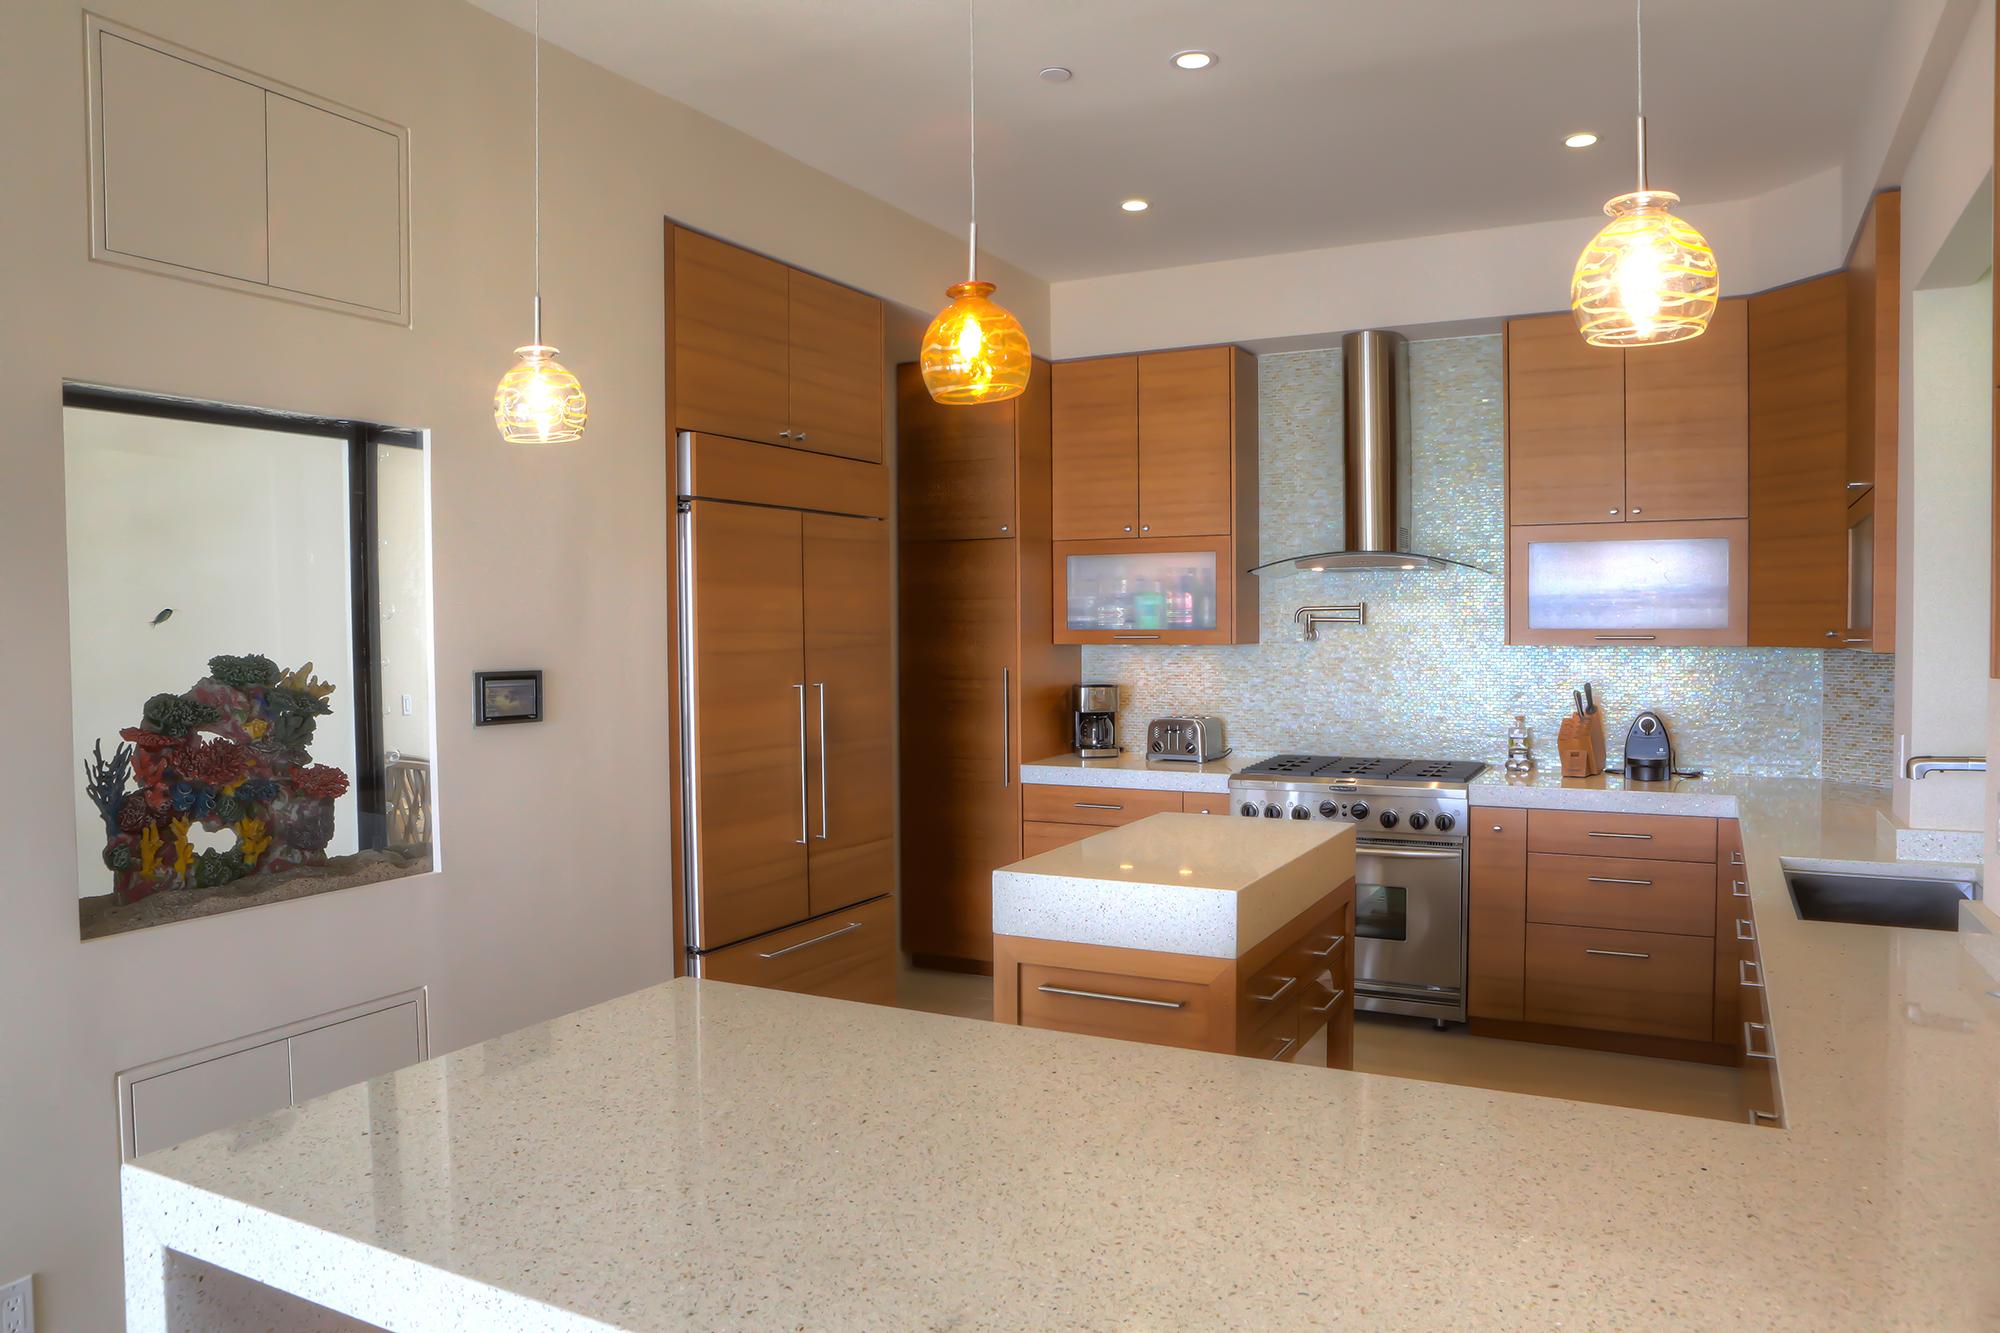 Kitchen_Angle_2.jpg